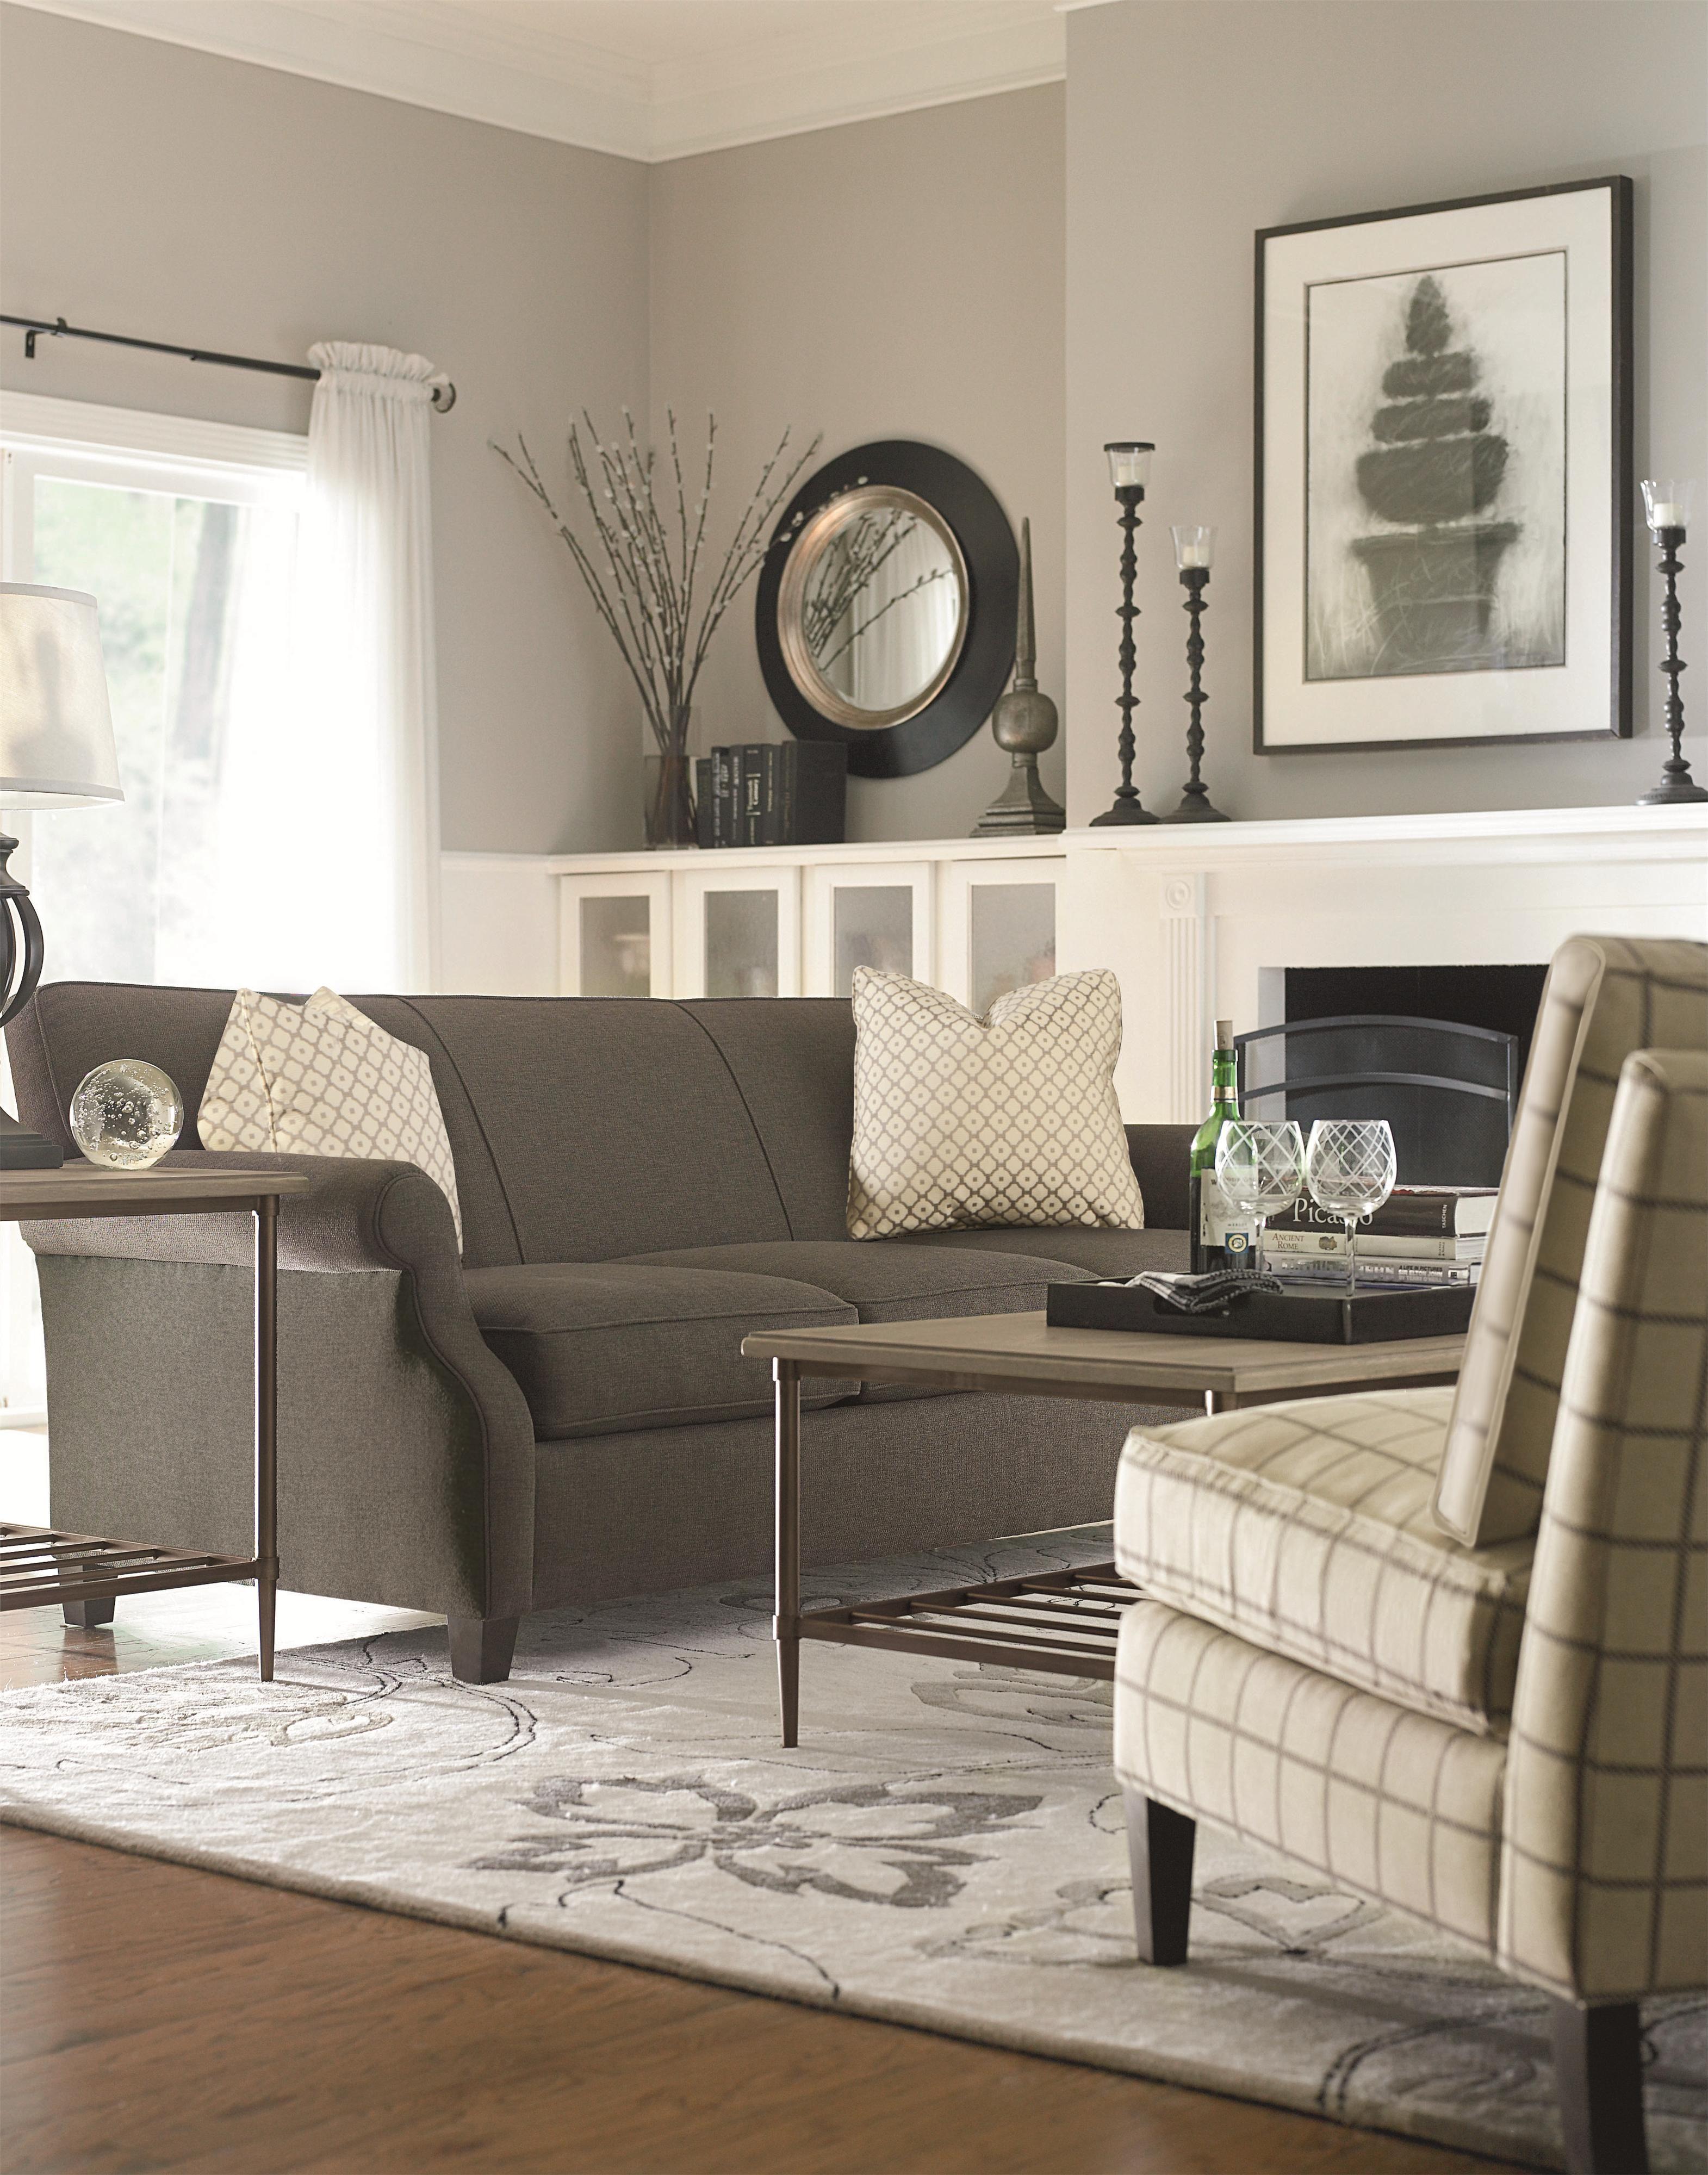 dort kann man sich wohlf hlen dinge die ich gerne. Black Bedroom Furniture Sets. Home Design Ideas